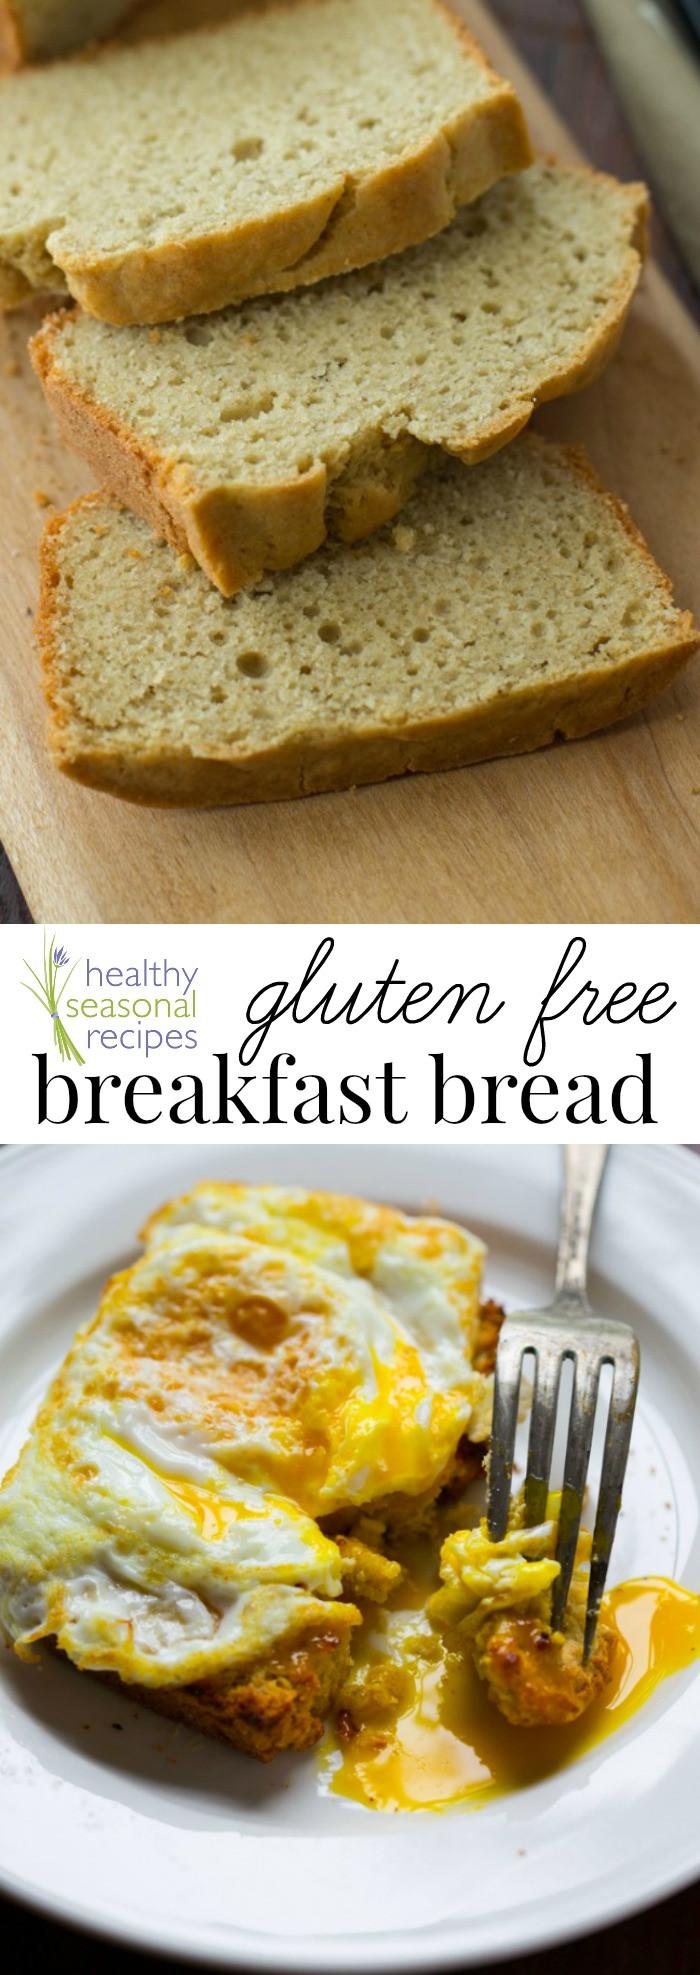 Gluten Free Dairy Free Breakfast Recipes  gluten free breakfast bread Healthy Seasonal Recipes